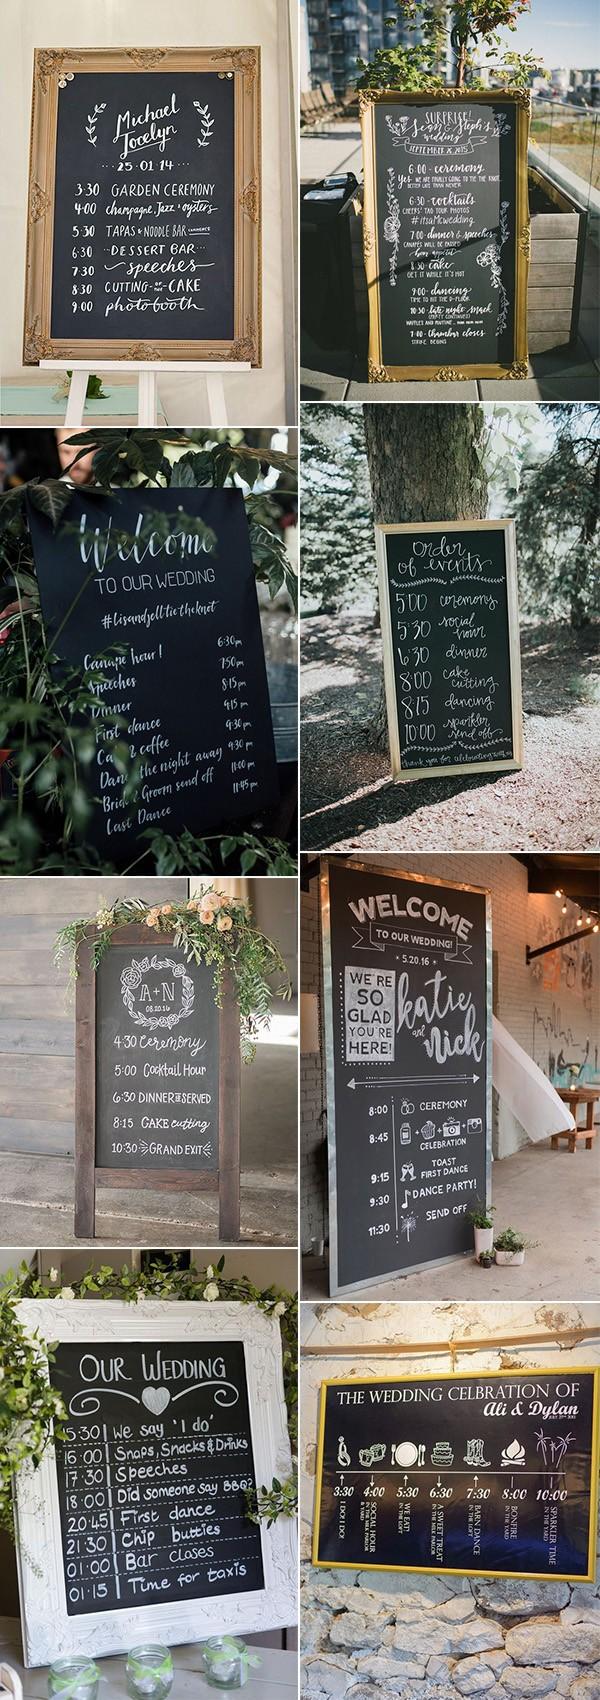 chic vintage chalkboard wedding day timeline signs